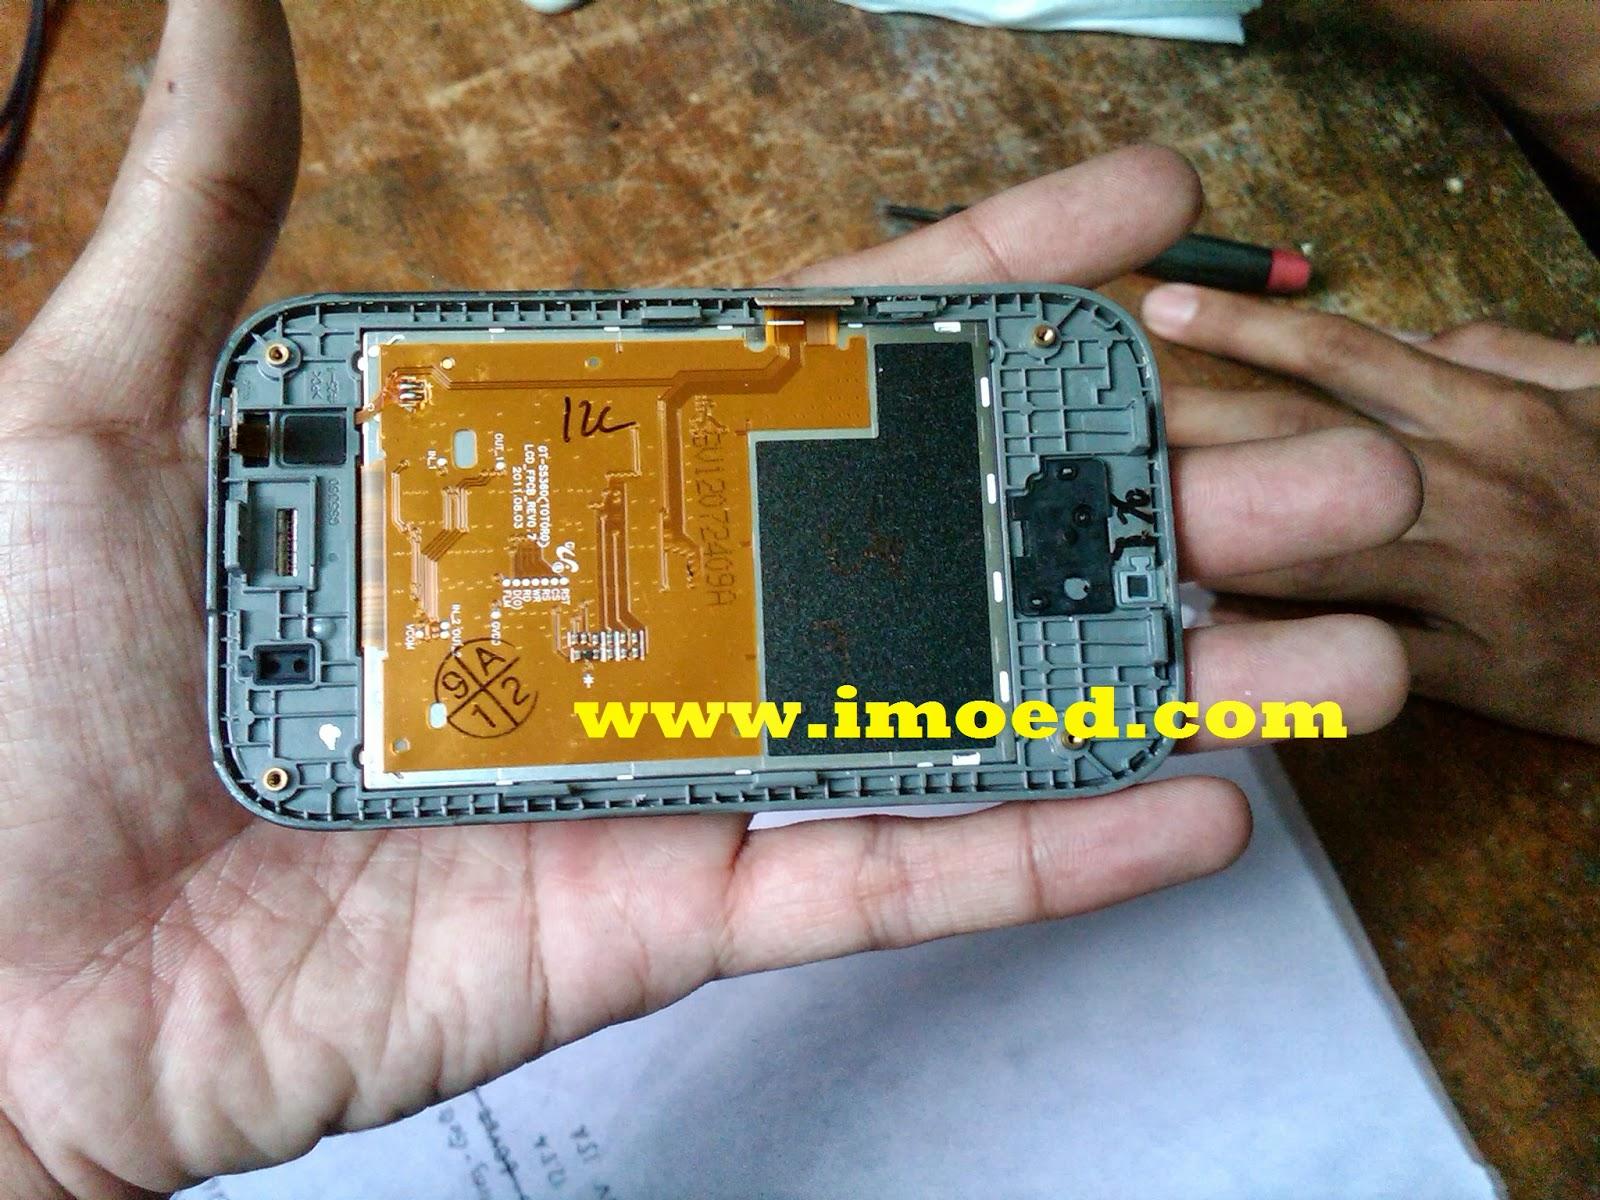 Tutorial Cara Bongkar Samsung Galaxy Young Gt S5360 Pramud Pocket Neo S5312 Putih